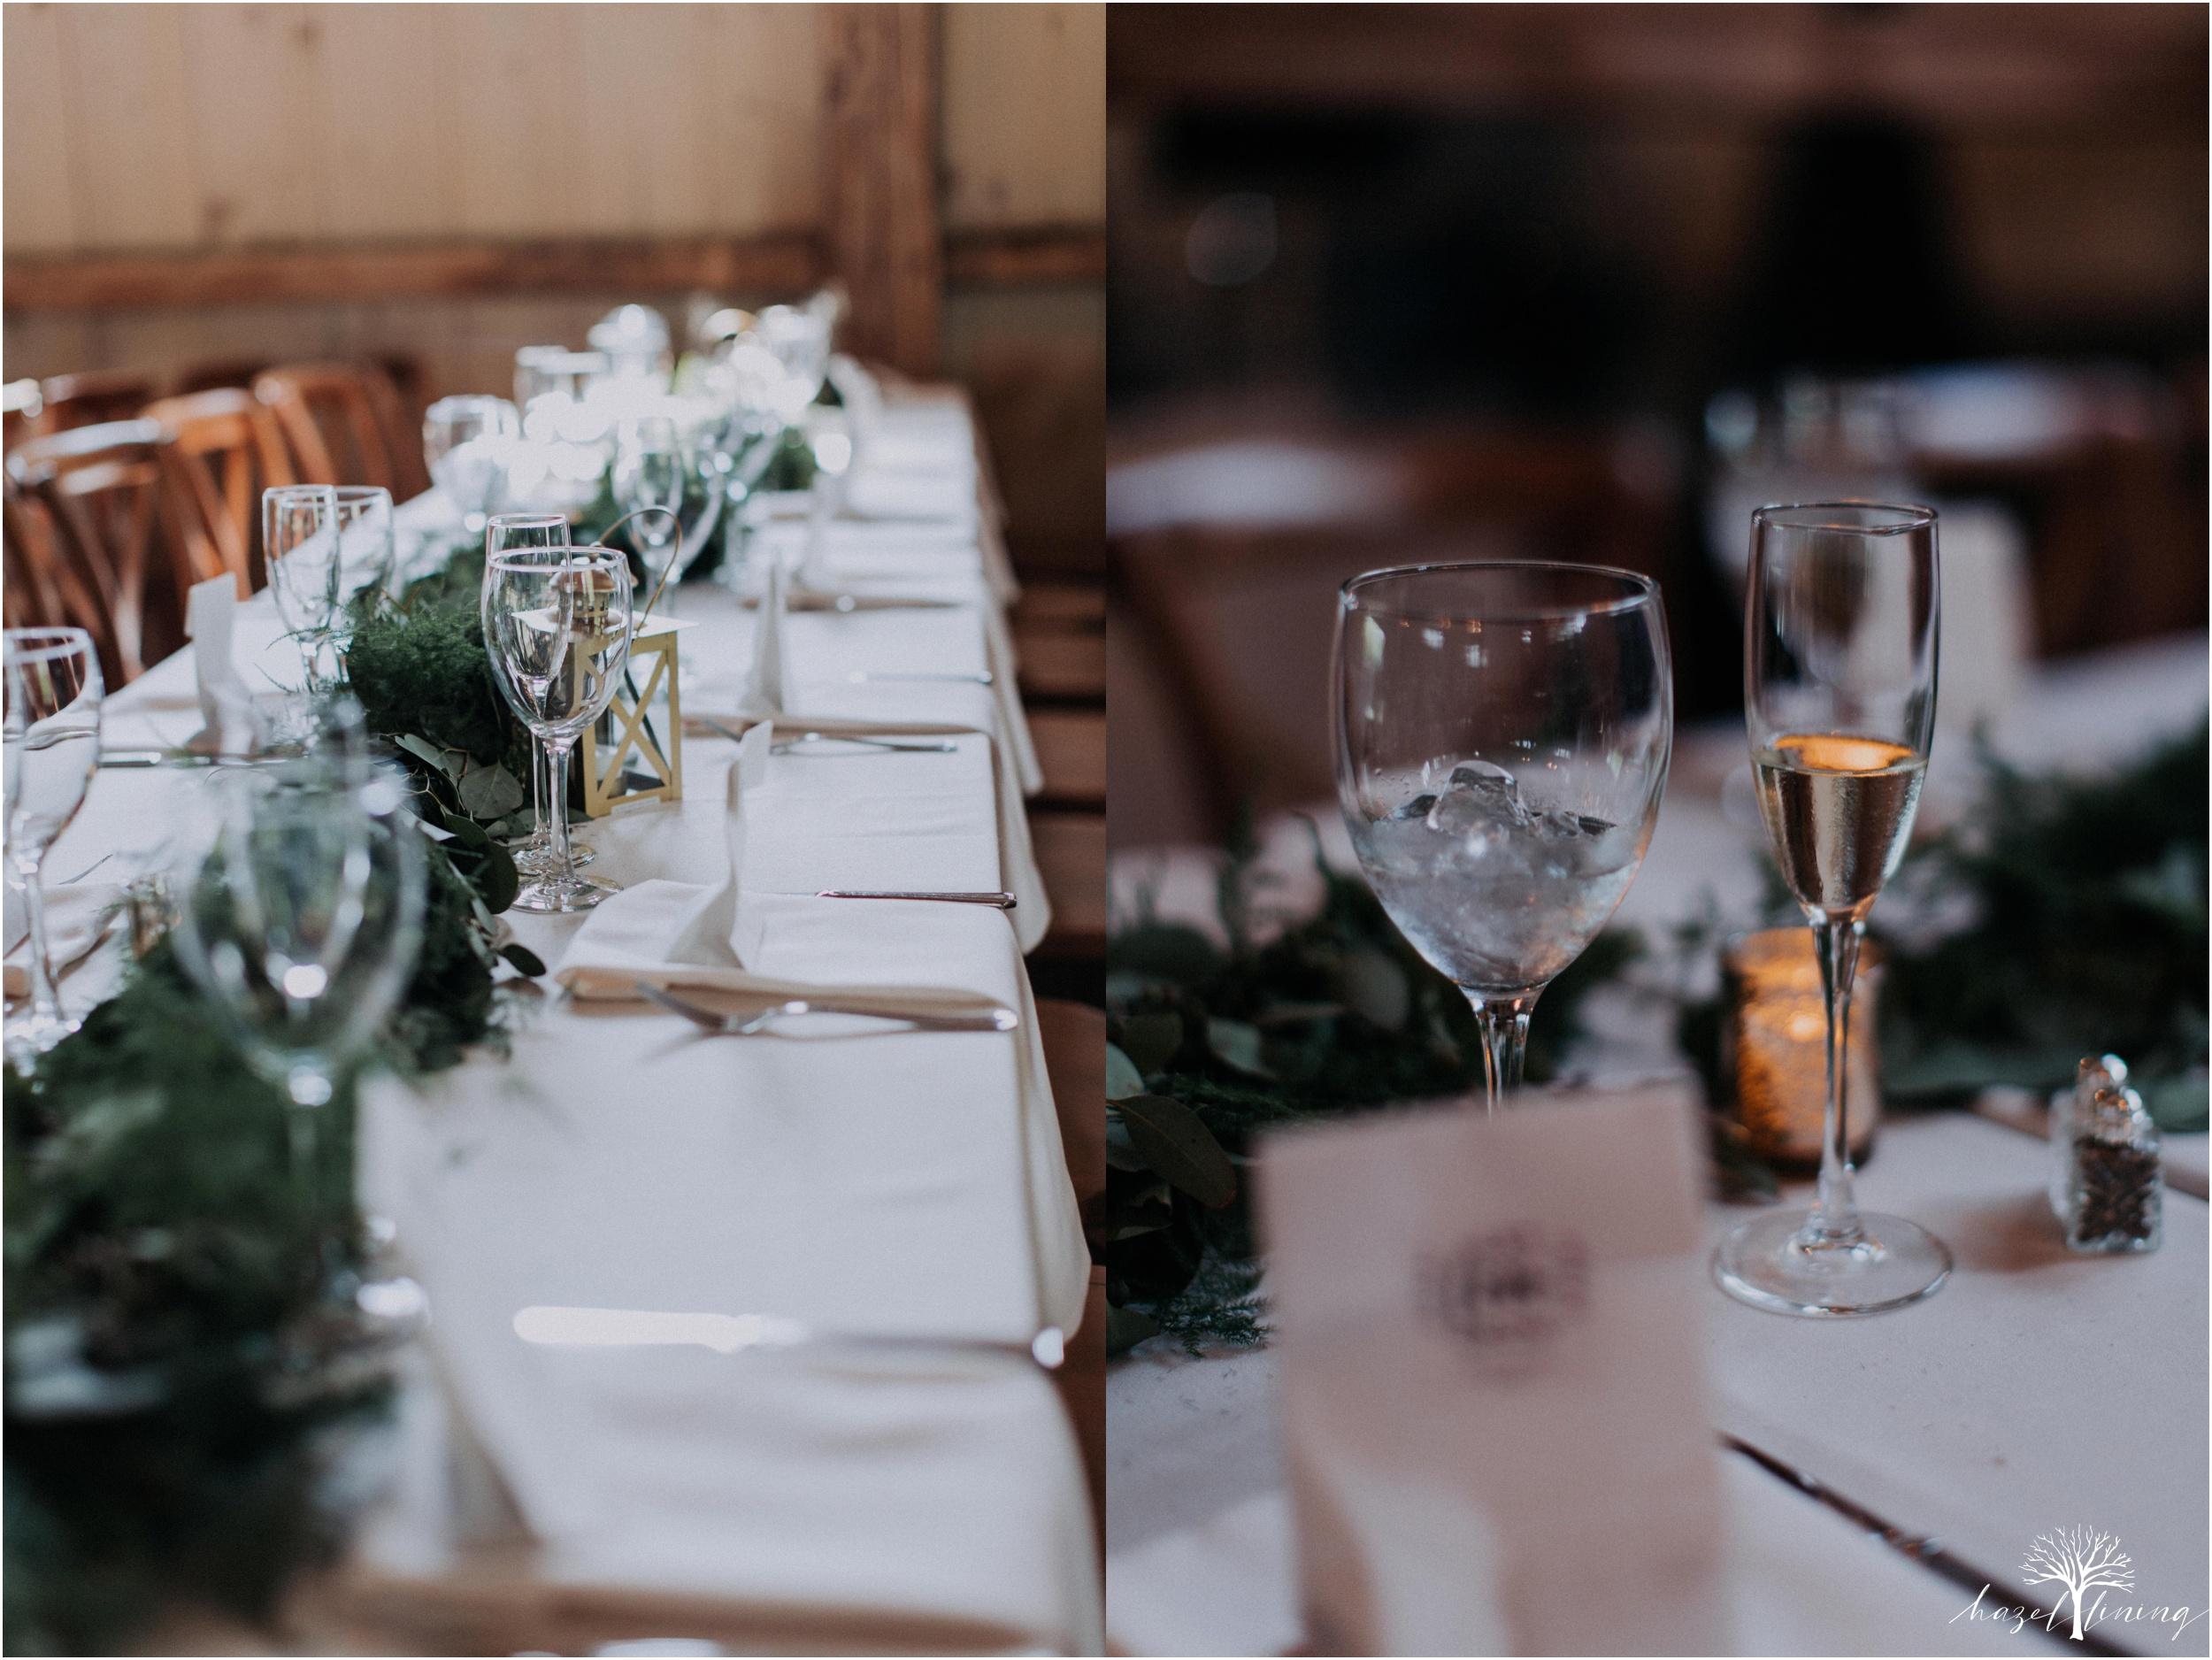 hazel-lining-travel-wedding-elopement-photography-lisa-landon-shoemaker-the-farm-bakery-and-events-bucks-county-quakertown-pennsylvania-summer-country-outdoor-farm-wedding_0109.jpg